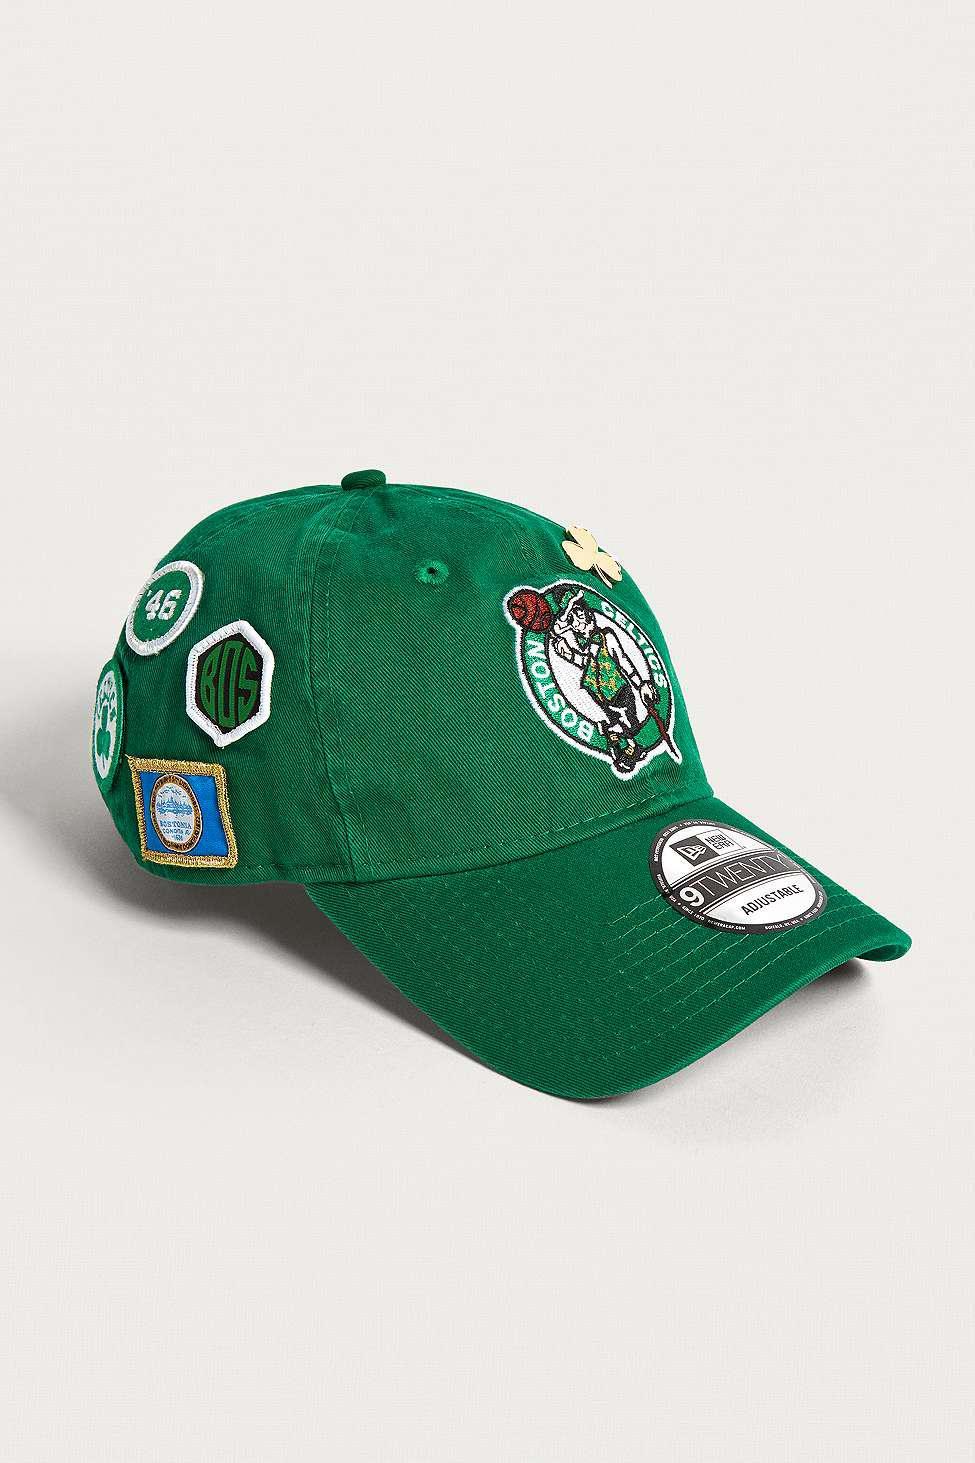 ecffb2f023b8cb sale boston celtics new era nba city series 9fiftysnapbackhatcap 31.99  875bd 494bb; discount code for ktz 9twenty celtics nba draft cap in green  for men ...